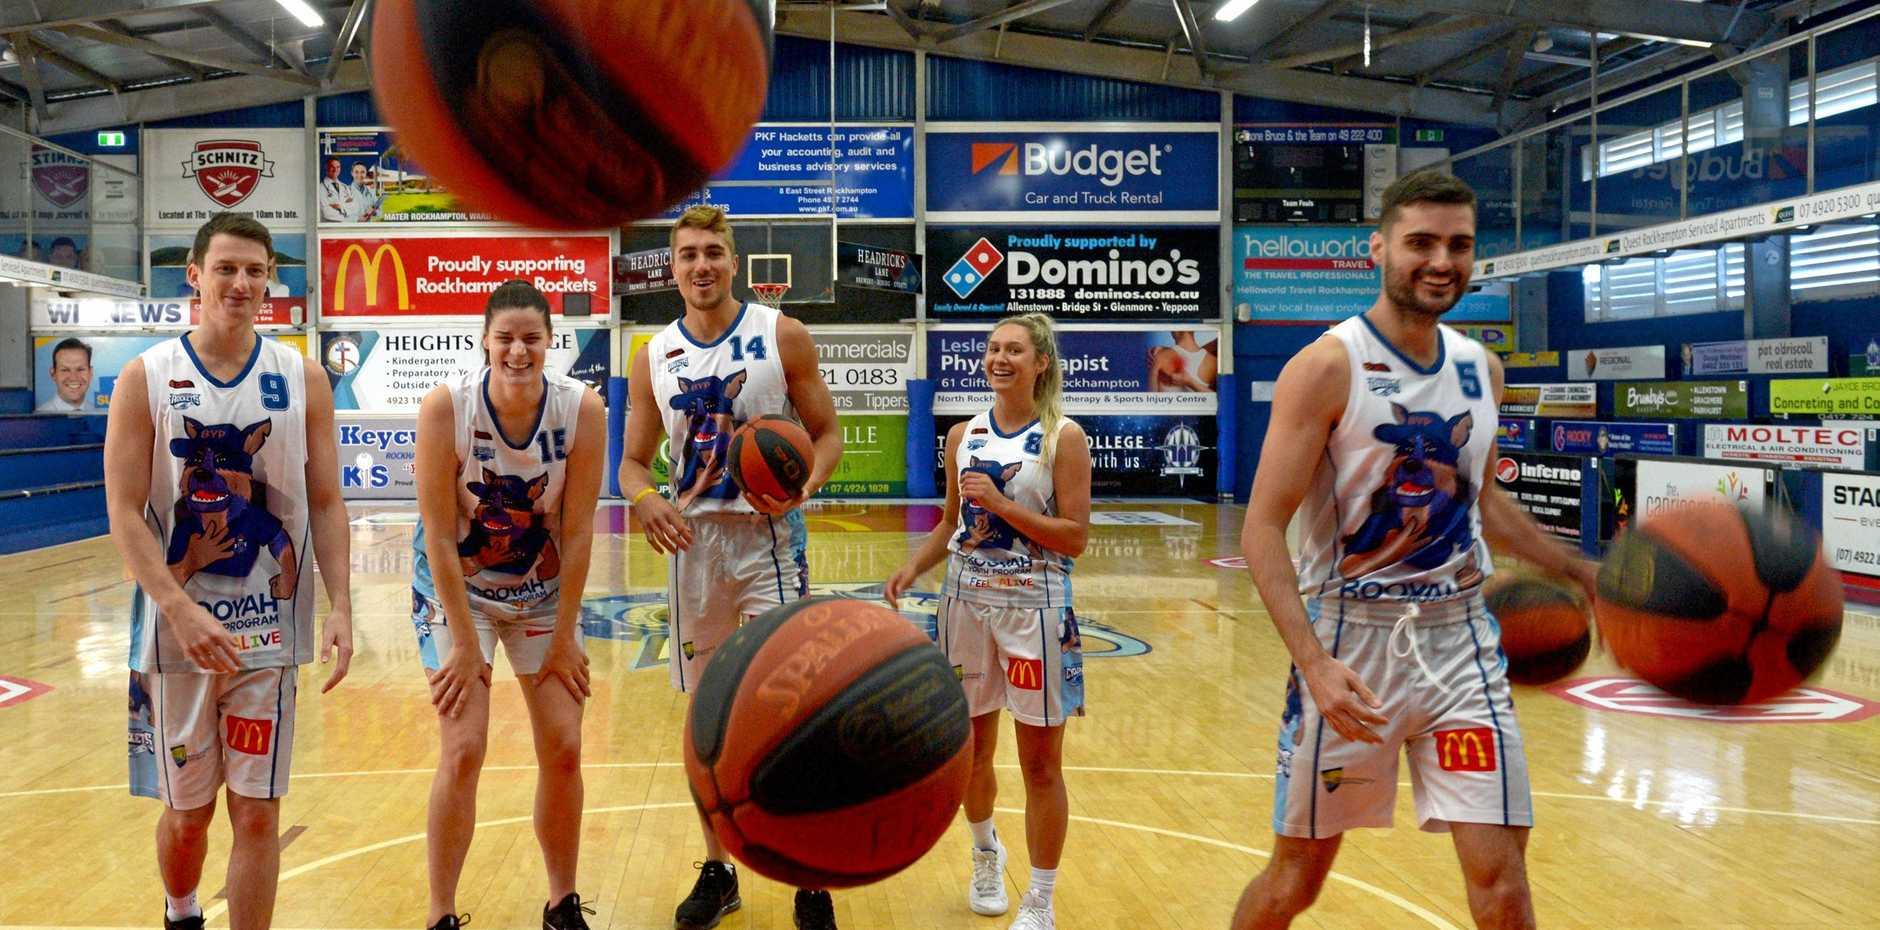 Rockhampton basketballers Shaun Bruce, Jacinta Vandenberg, Nelson Kahler, Brooke Blair and Jimmy Mitchell model the new Project Booyah kit